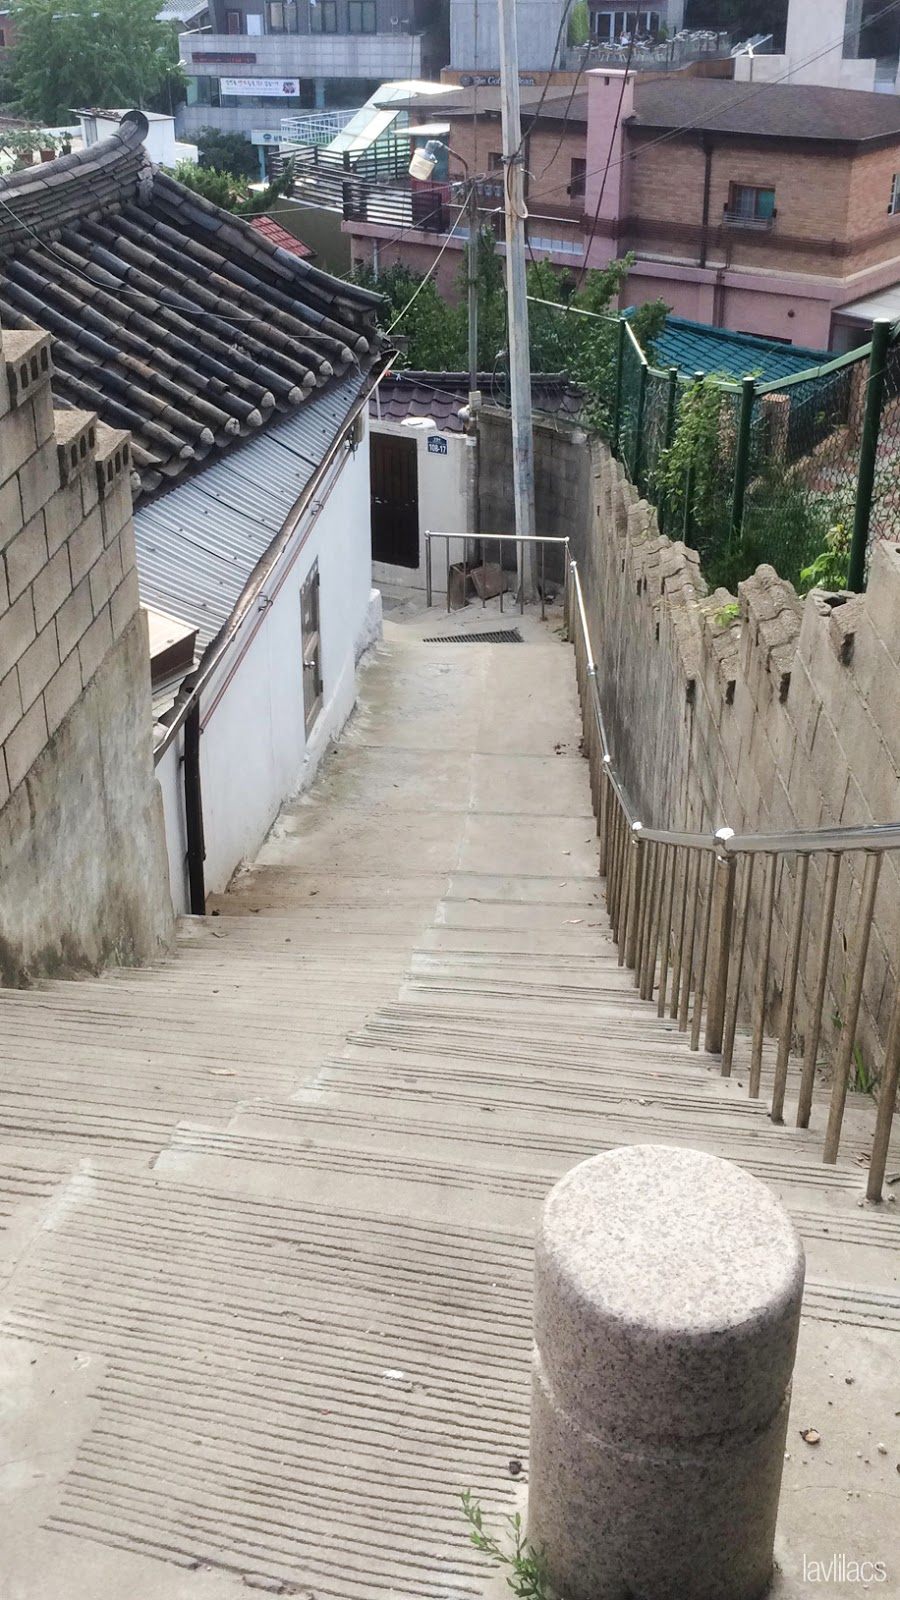 Seoul, Korea - Summer Study Abroad 2014 - Seoul City Touring - Bukchon Hanok Village 북촌한옥마을 北村韓屋마을